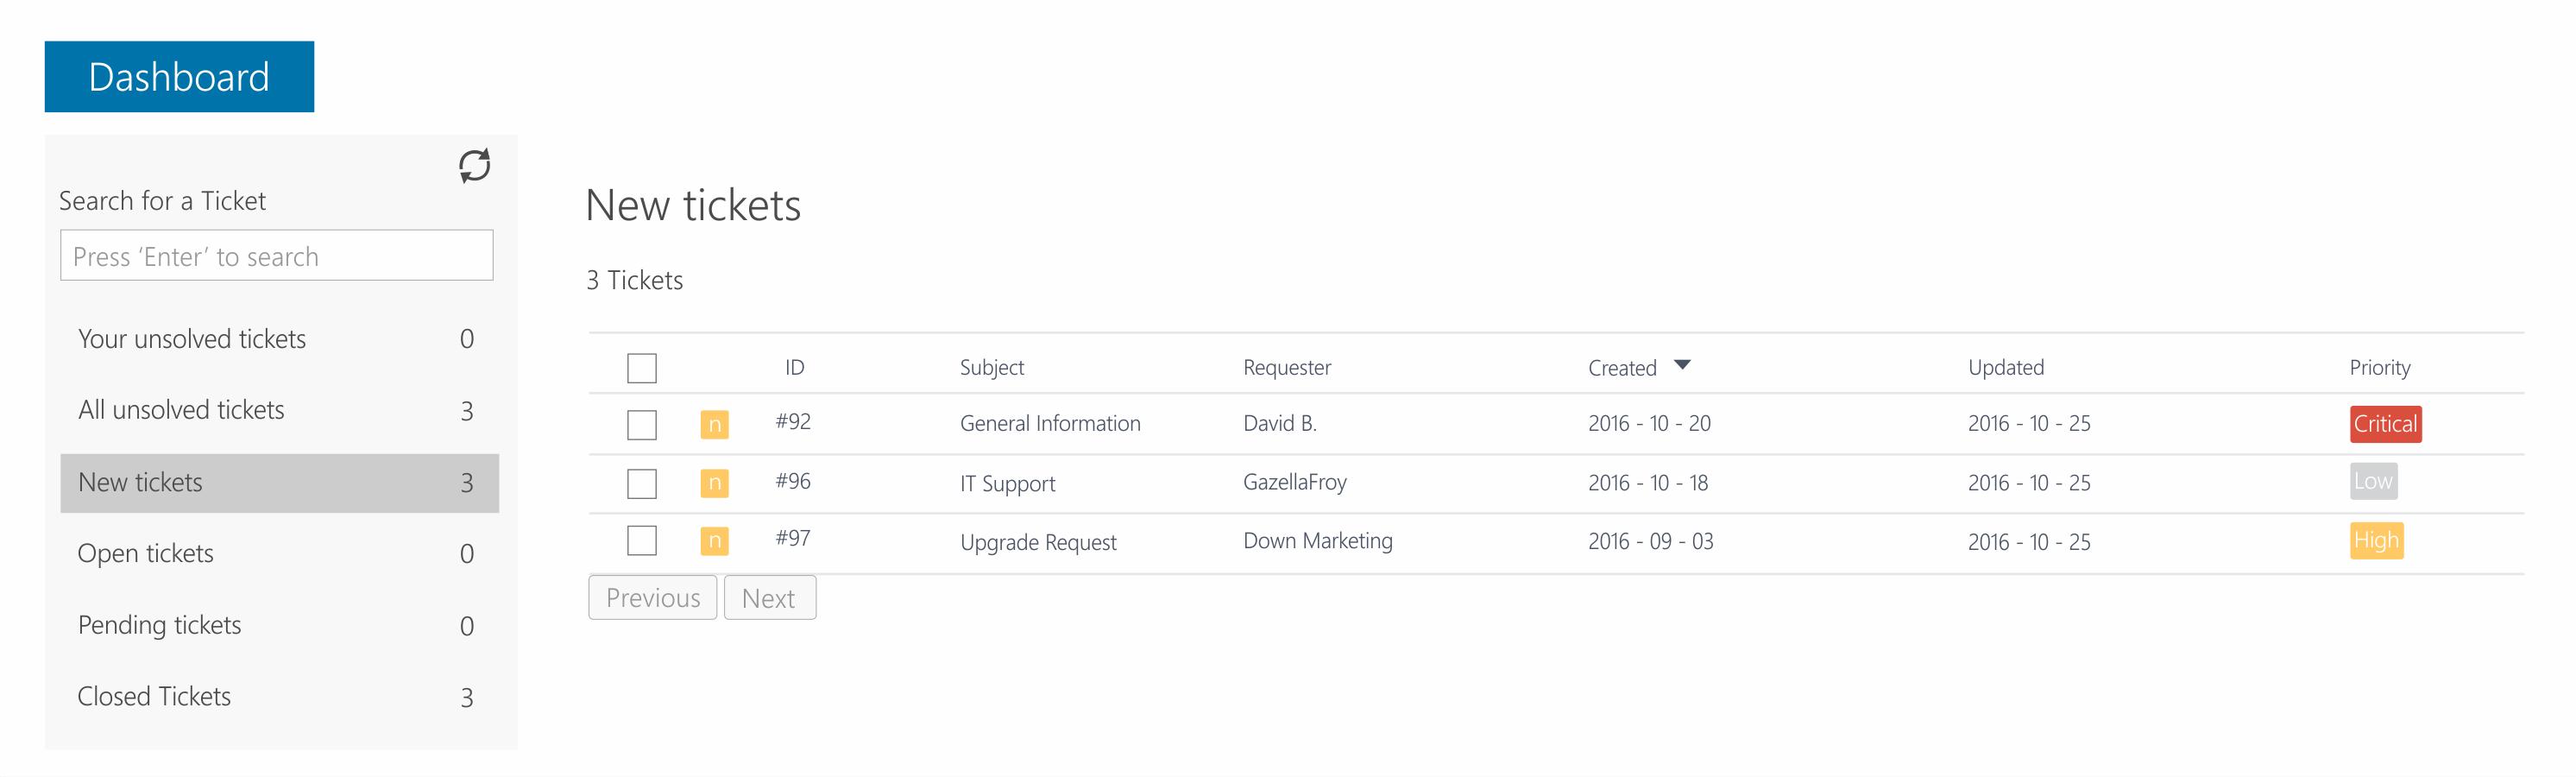 NiftyDesk Support Dashboard